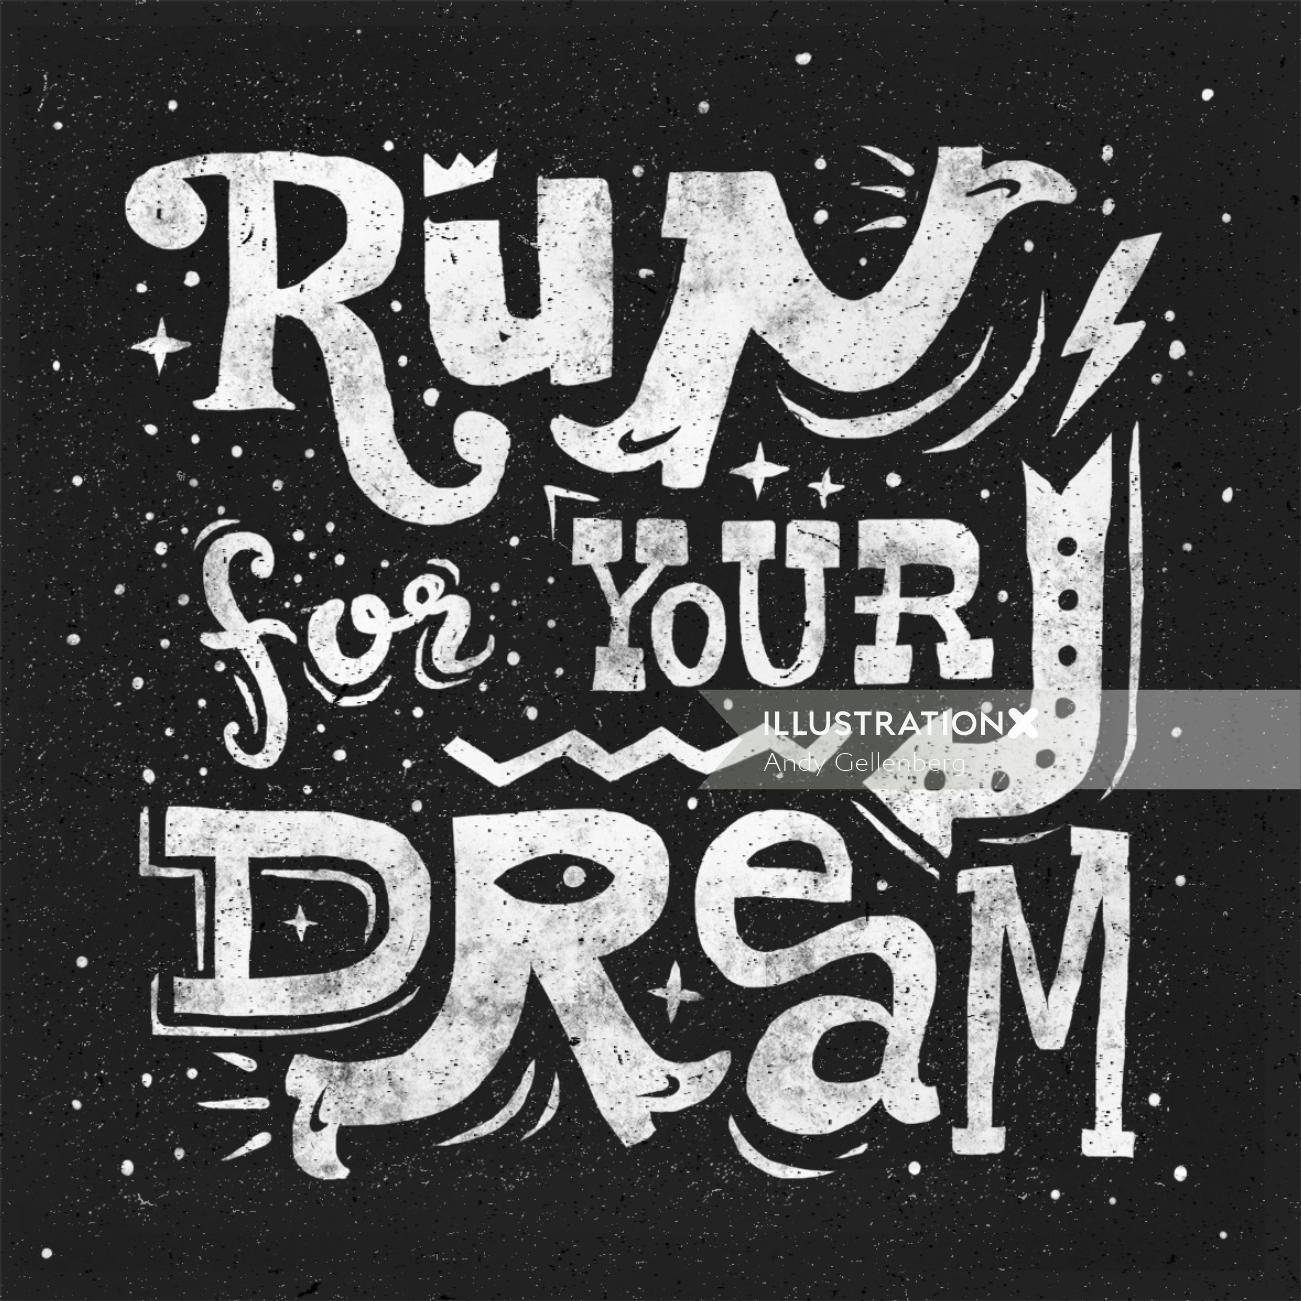 Lettering Run fr you dream